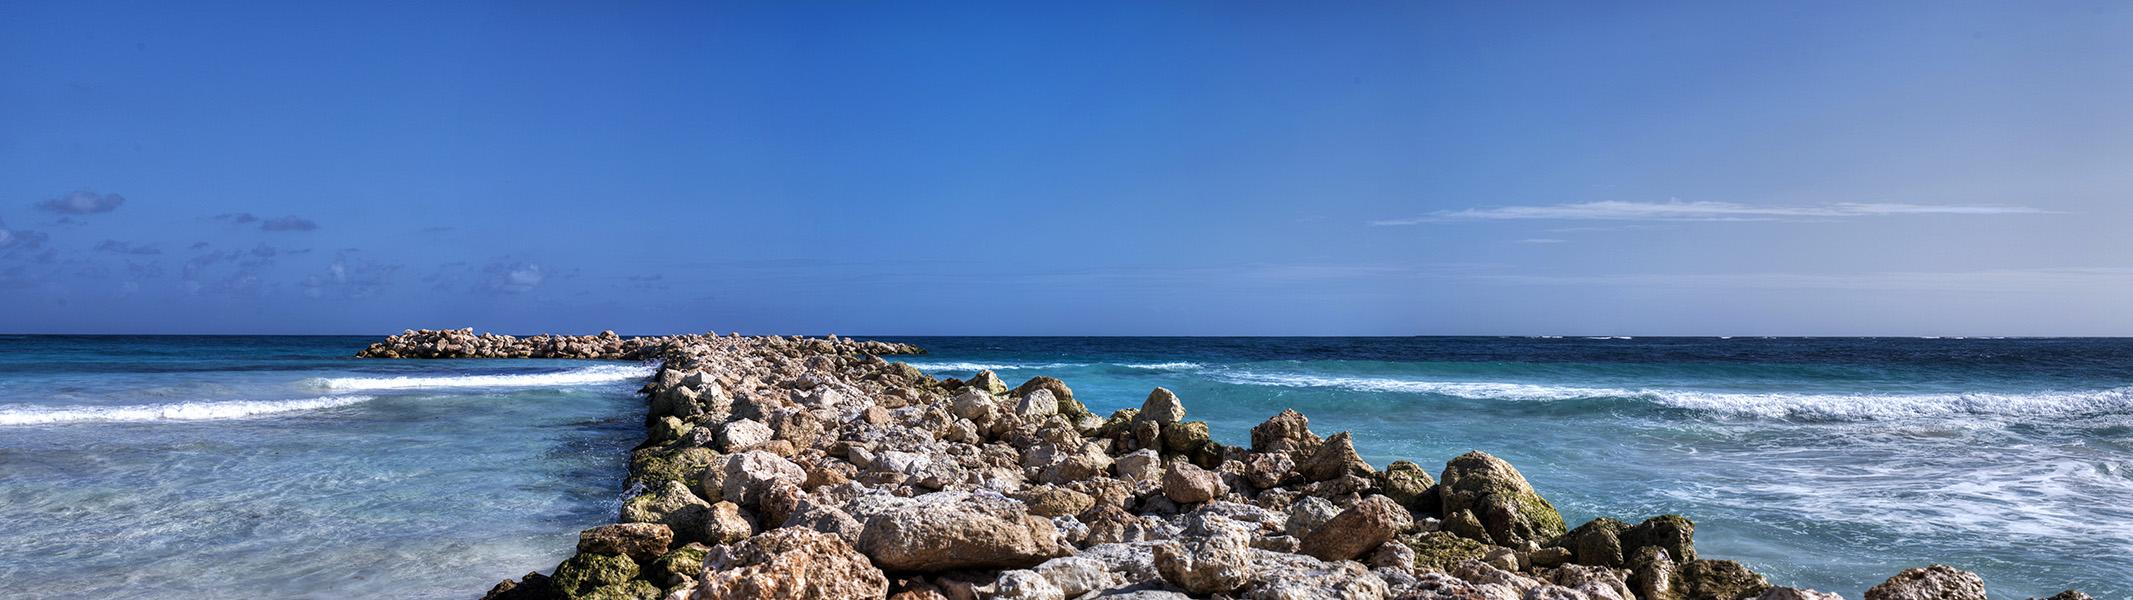 Hard Rock Resort Beach - Punta Cana, DR